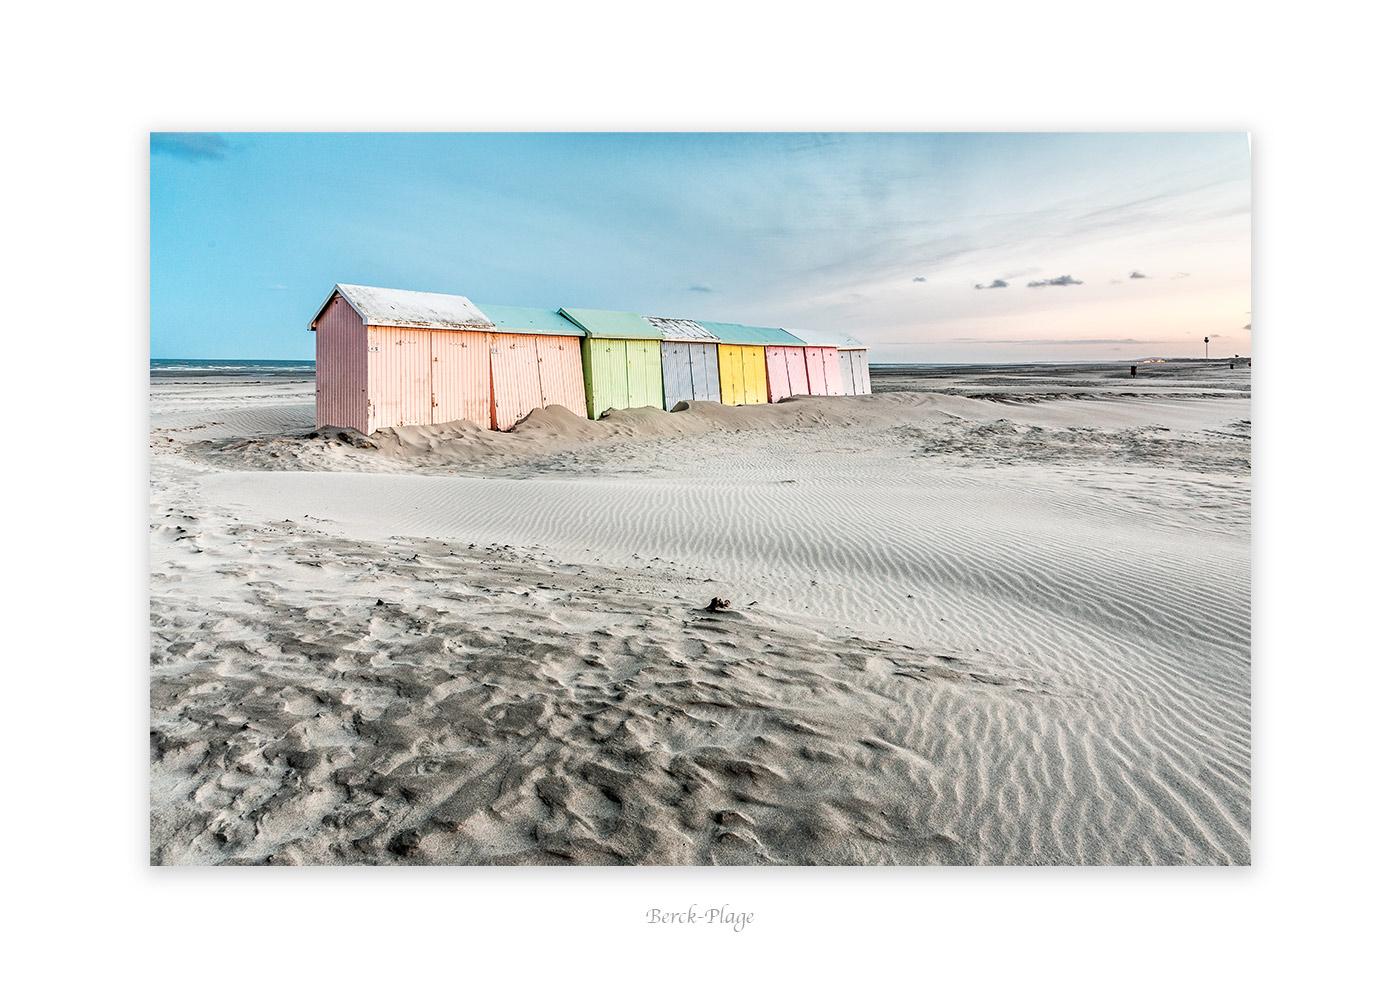 Cabines de plage, Berck